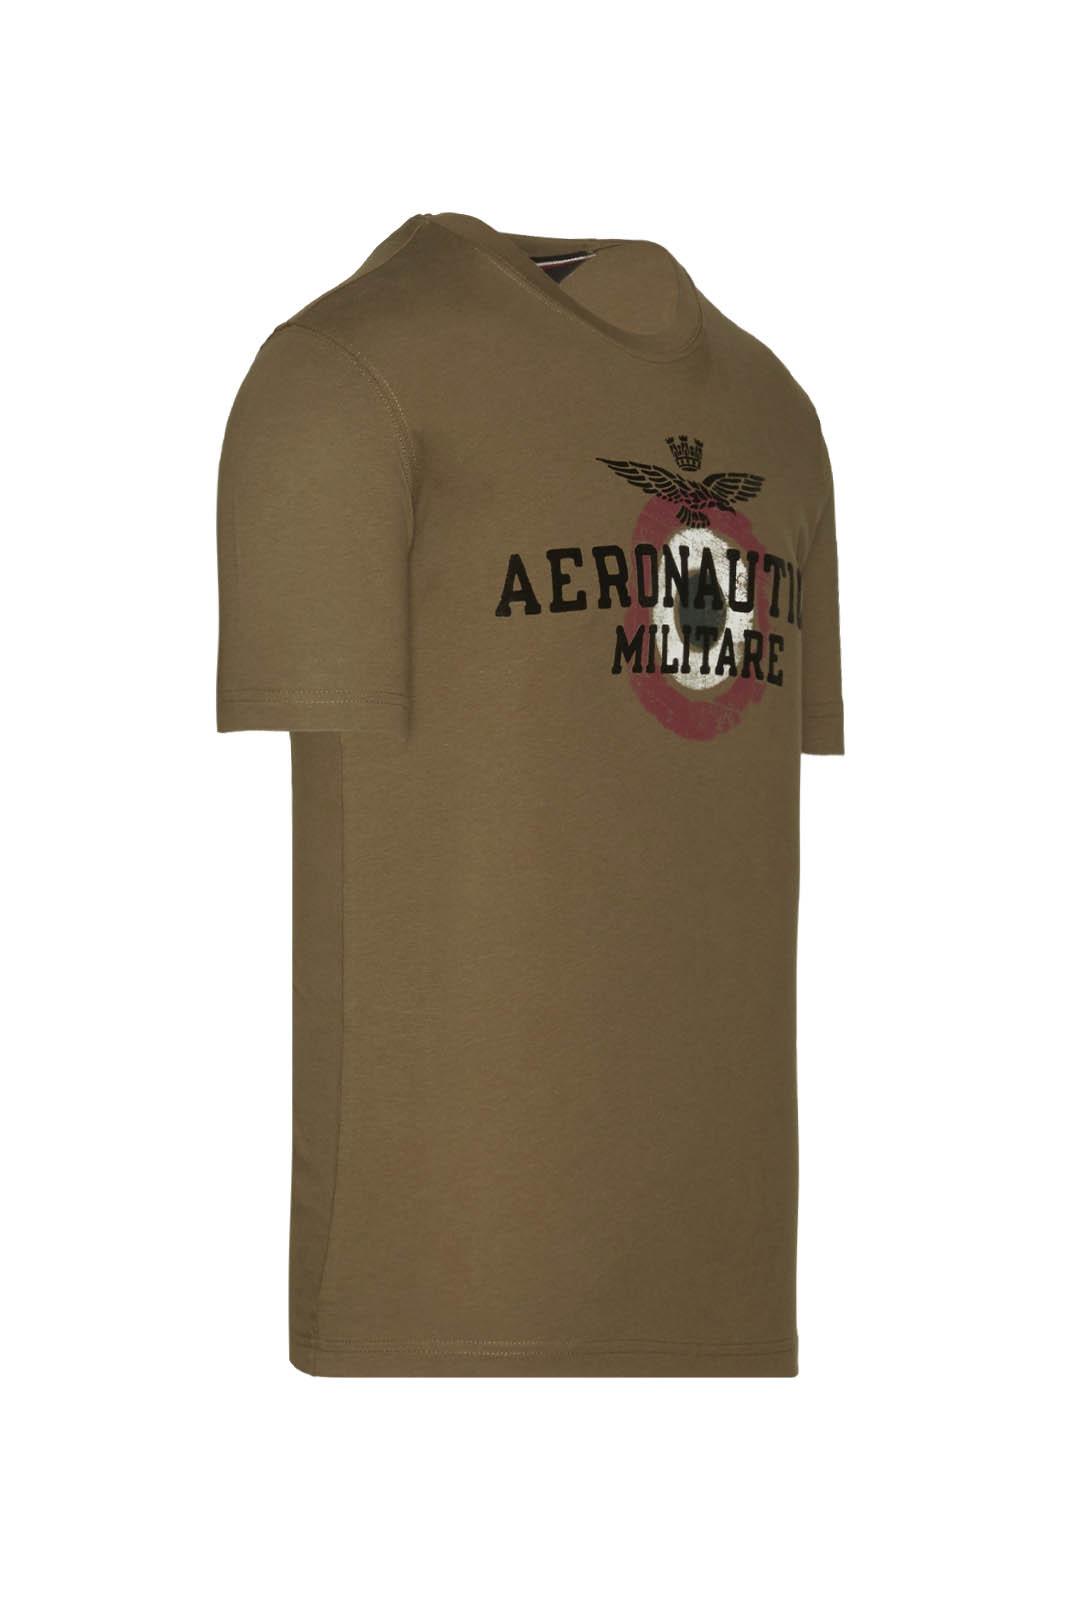 Iconic Aeronautica Militare t-shirt      3